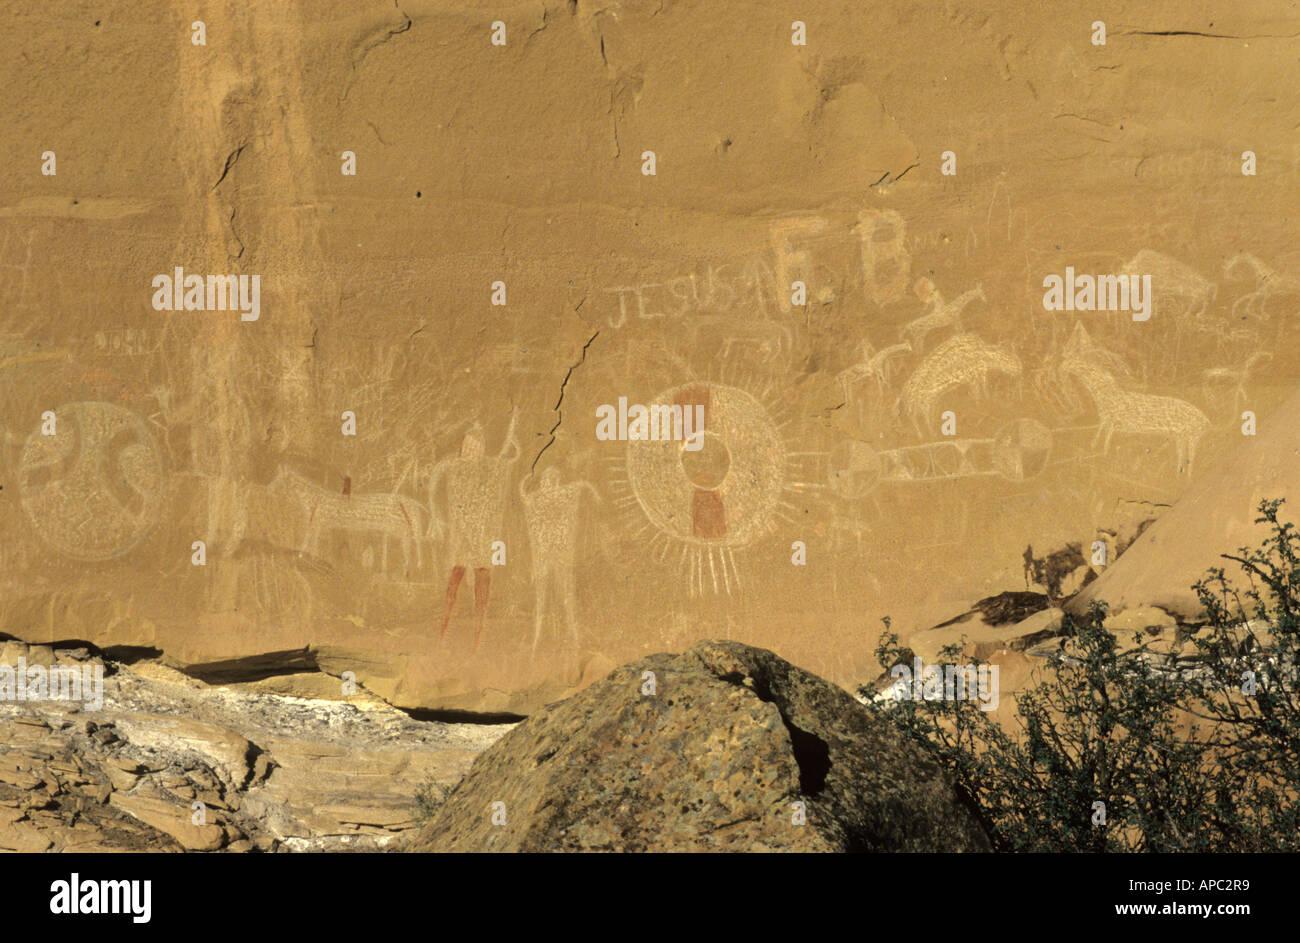 Luxury Native American Wall Decor Motif - The Wall Art Decorations ...